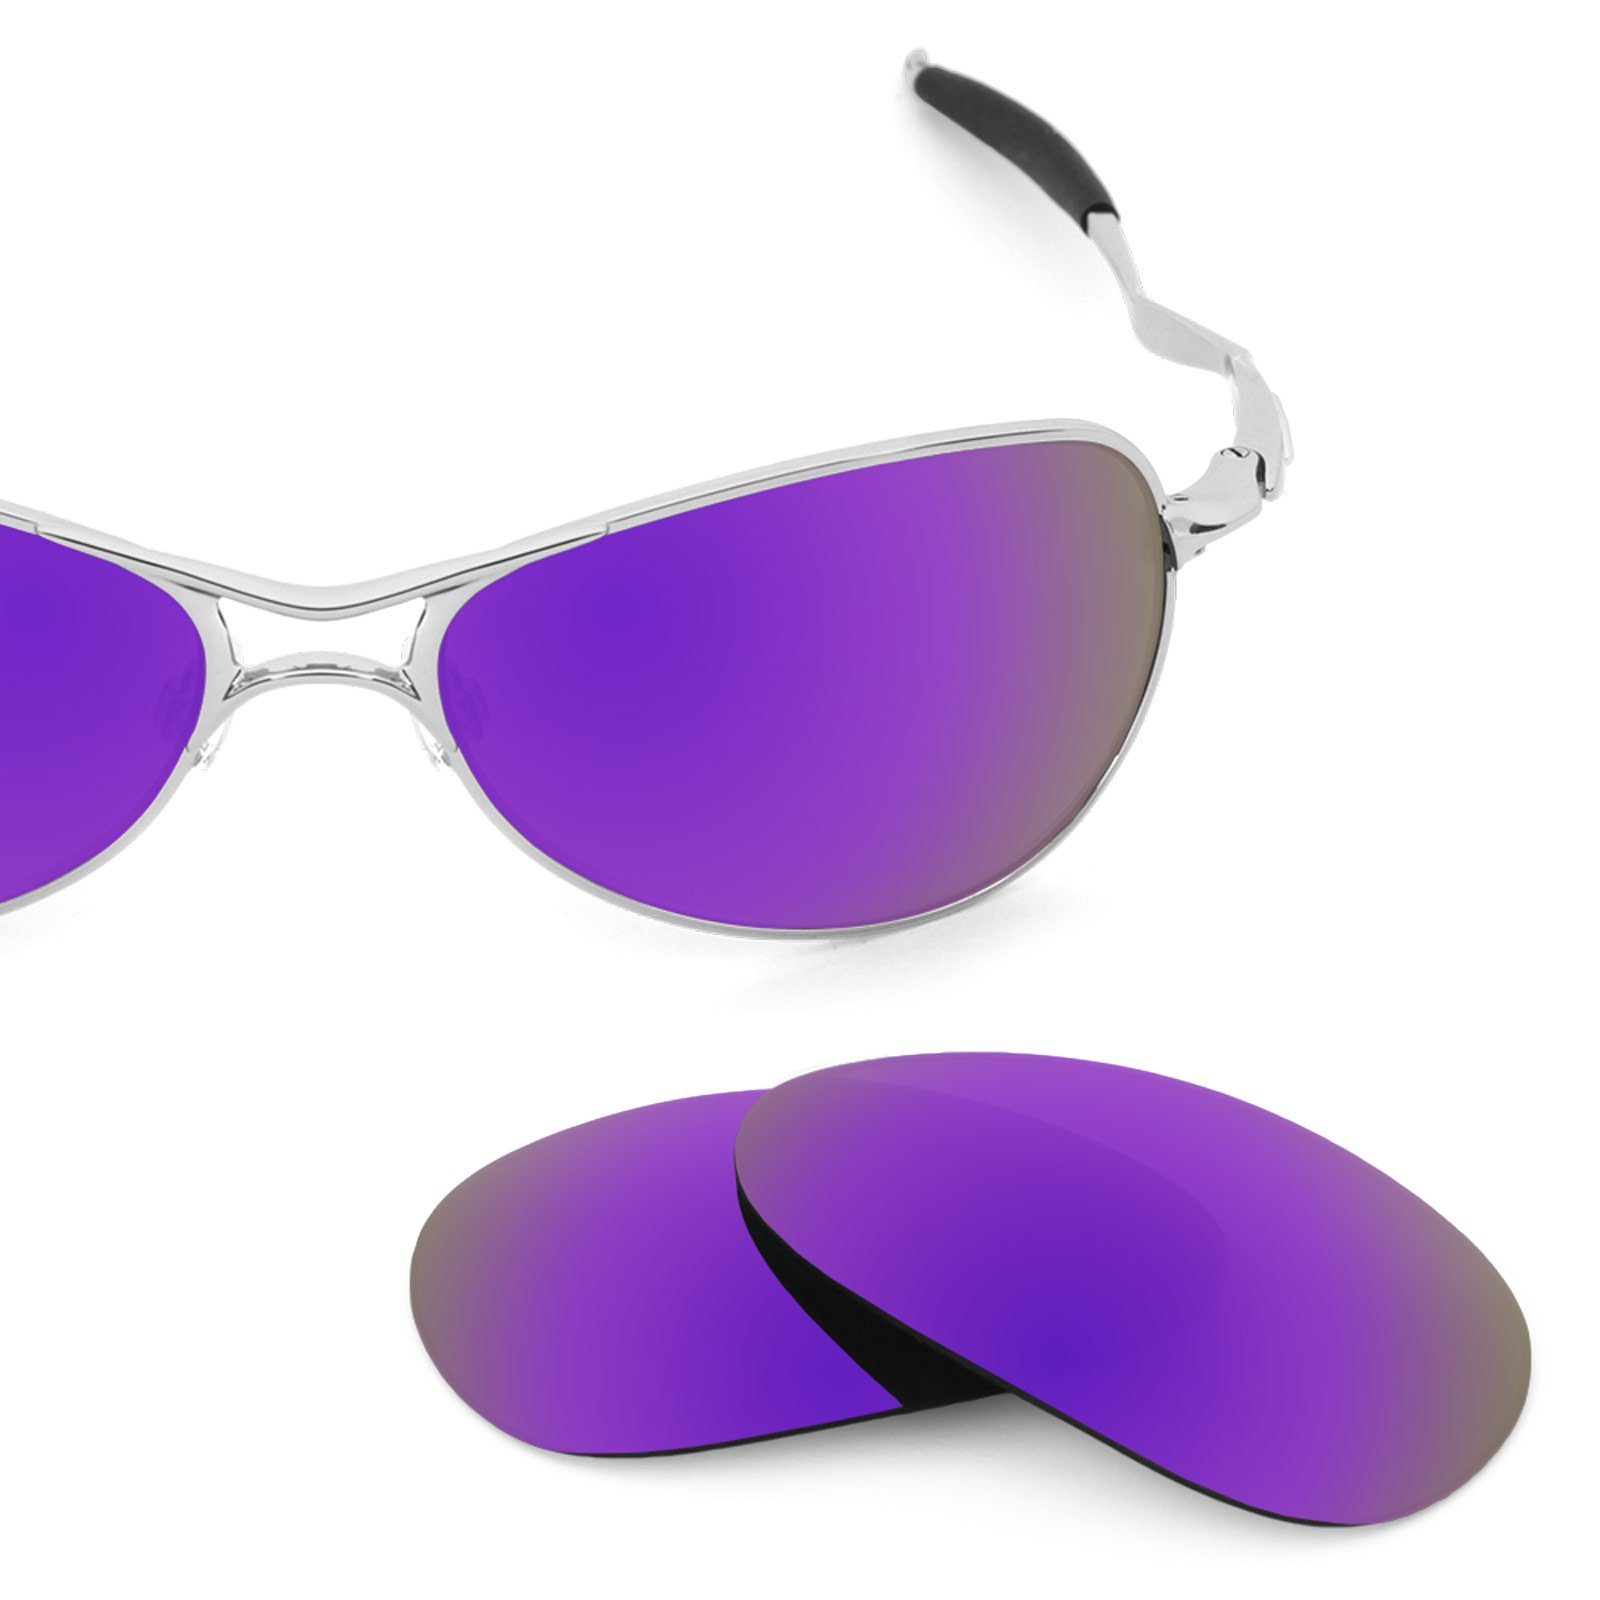 d3472a4629 Revant Polarized Replacement Lenses for Oakley Crosshair S Plasma Purple  MirrorShield